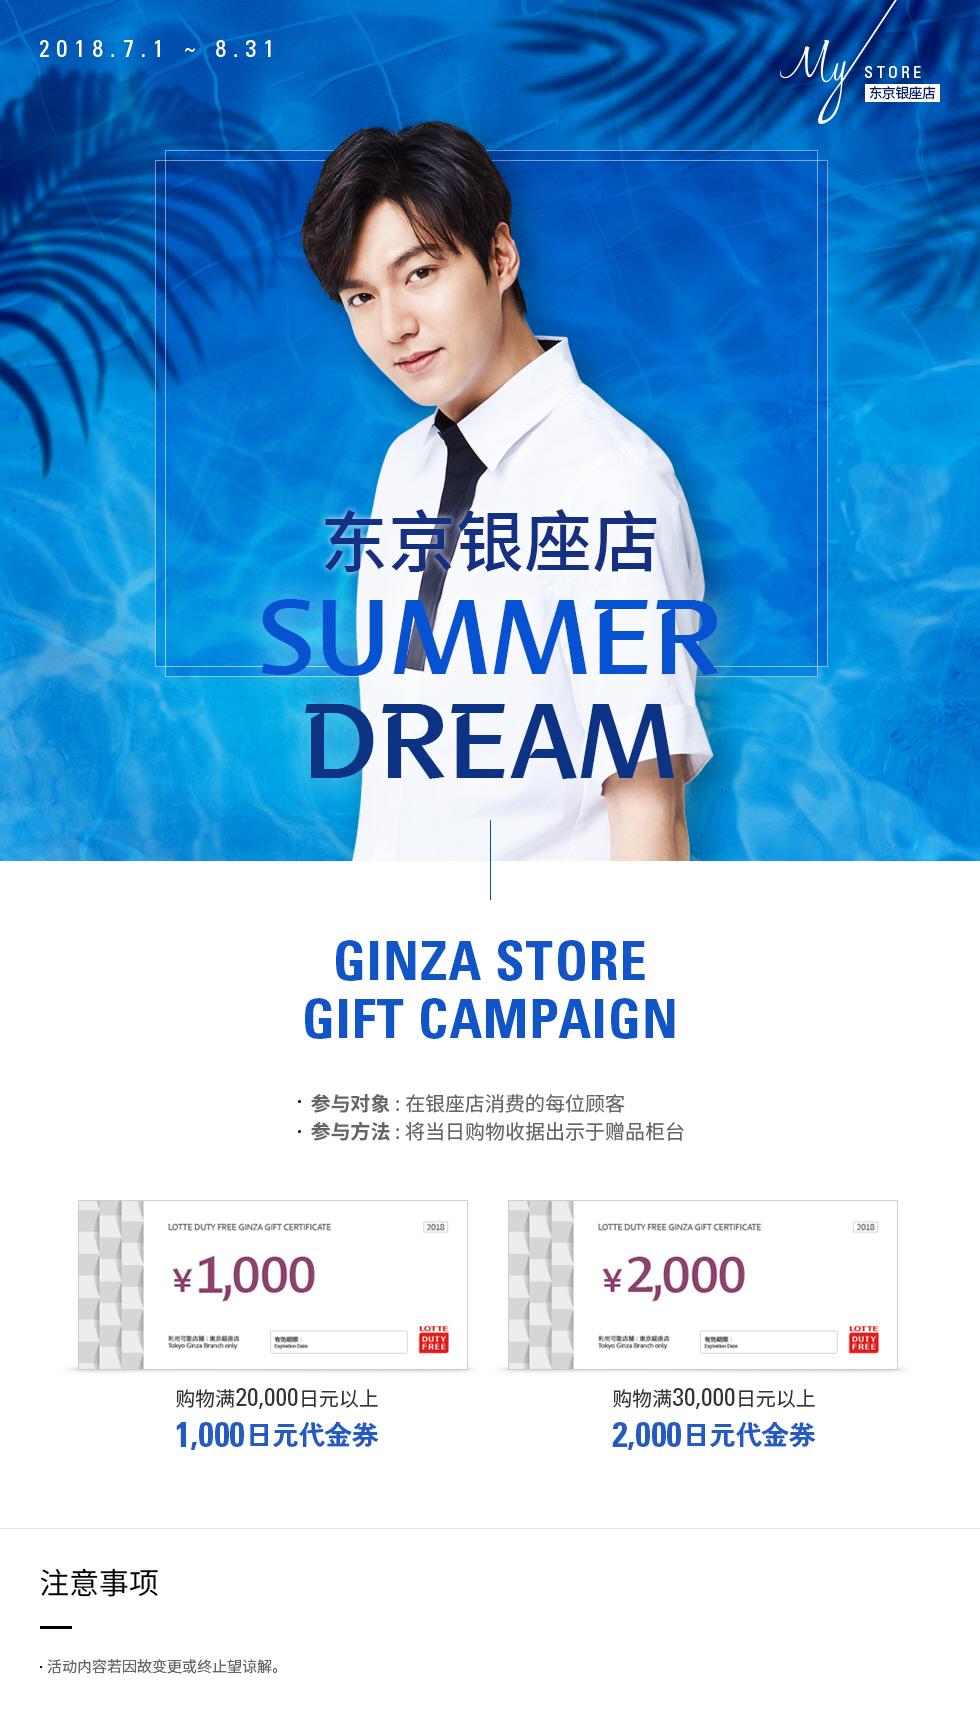 [东京银座店] SUMMER DREAM